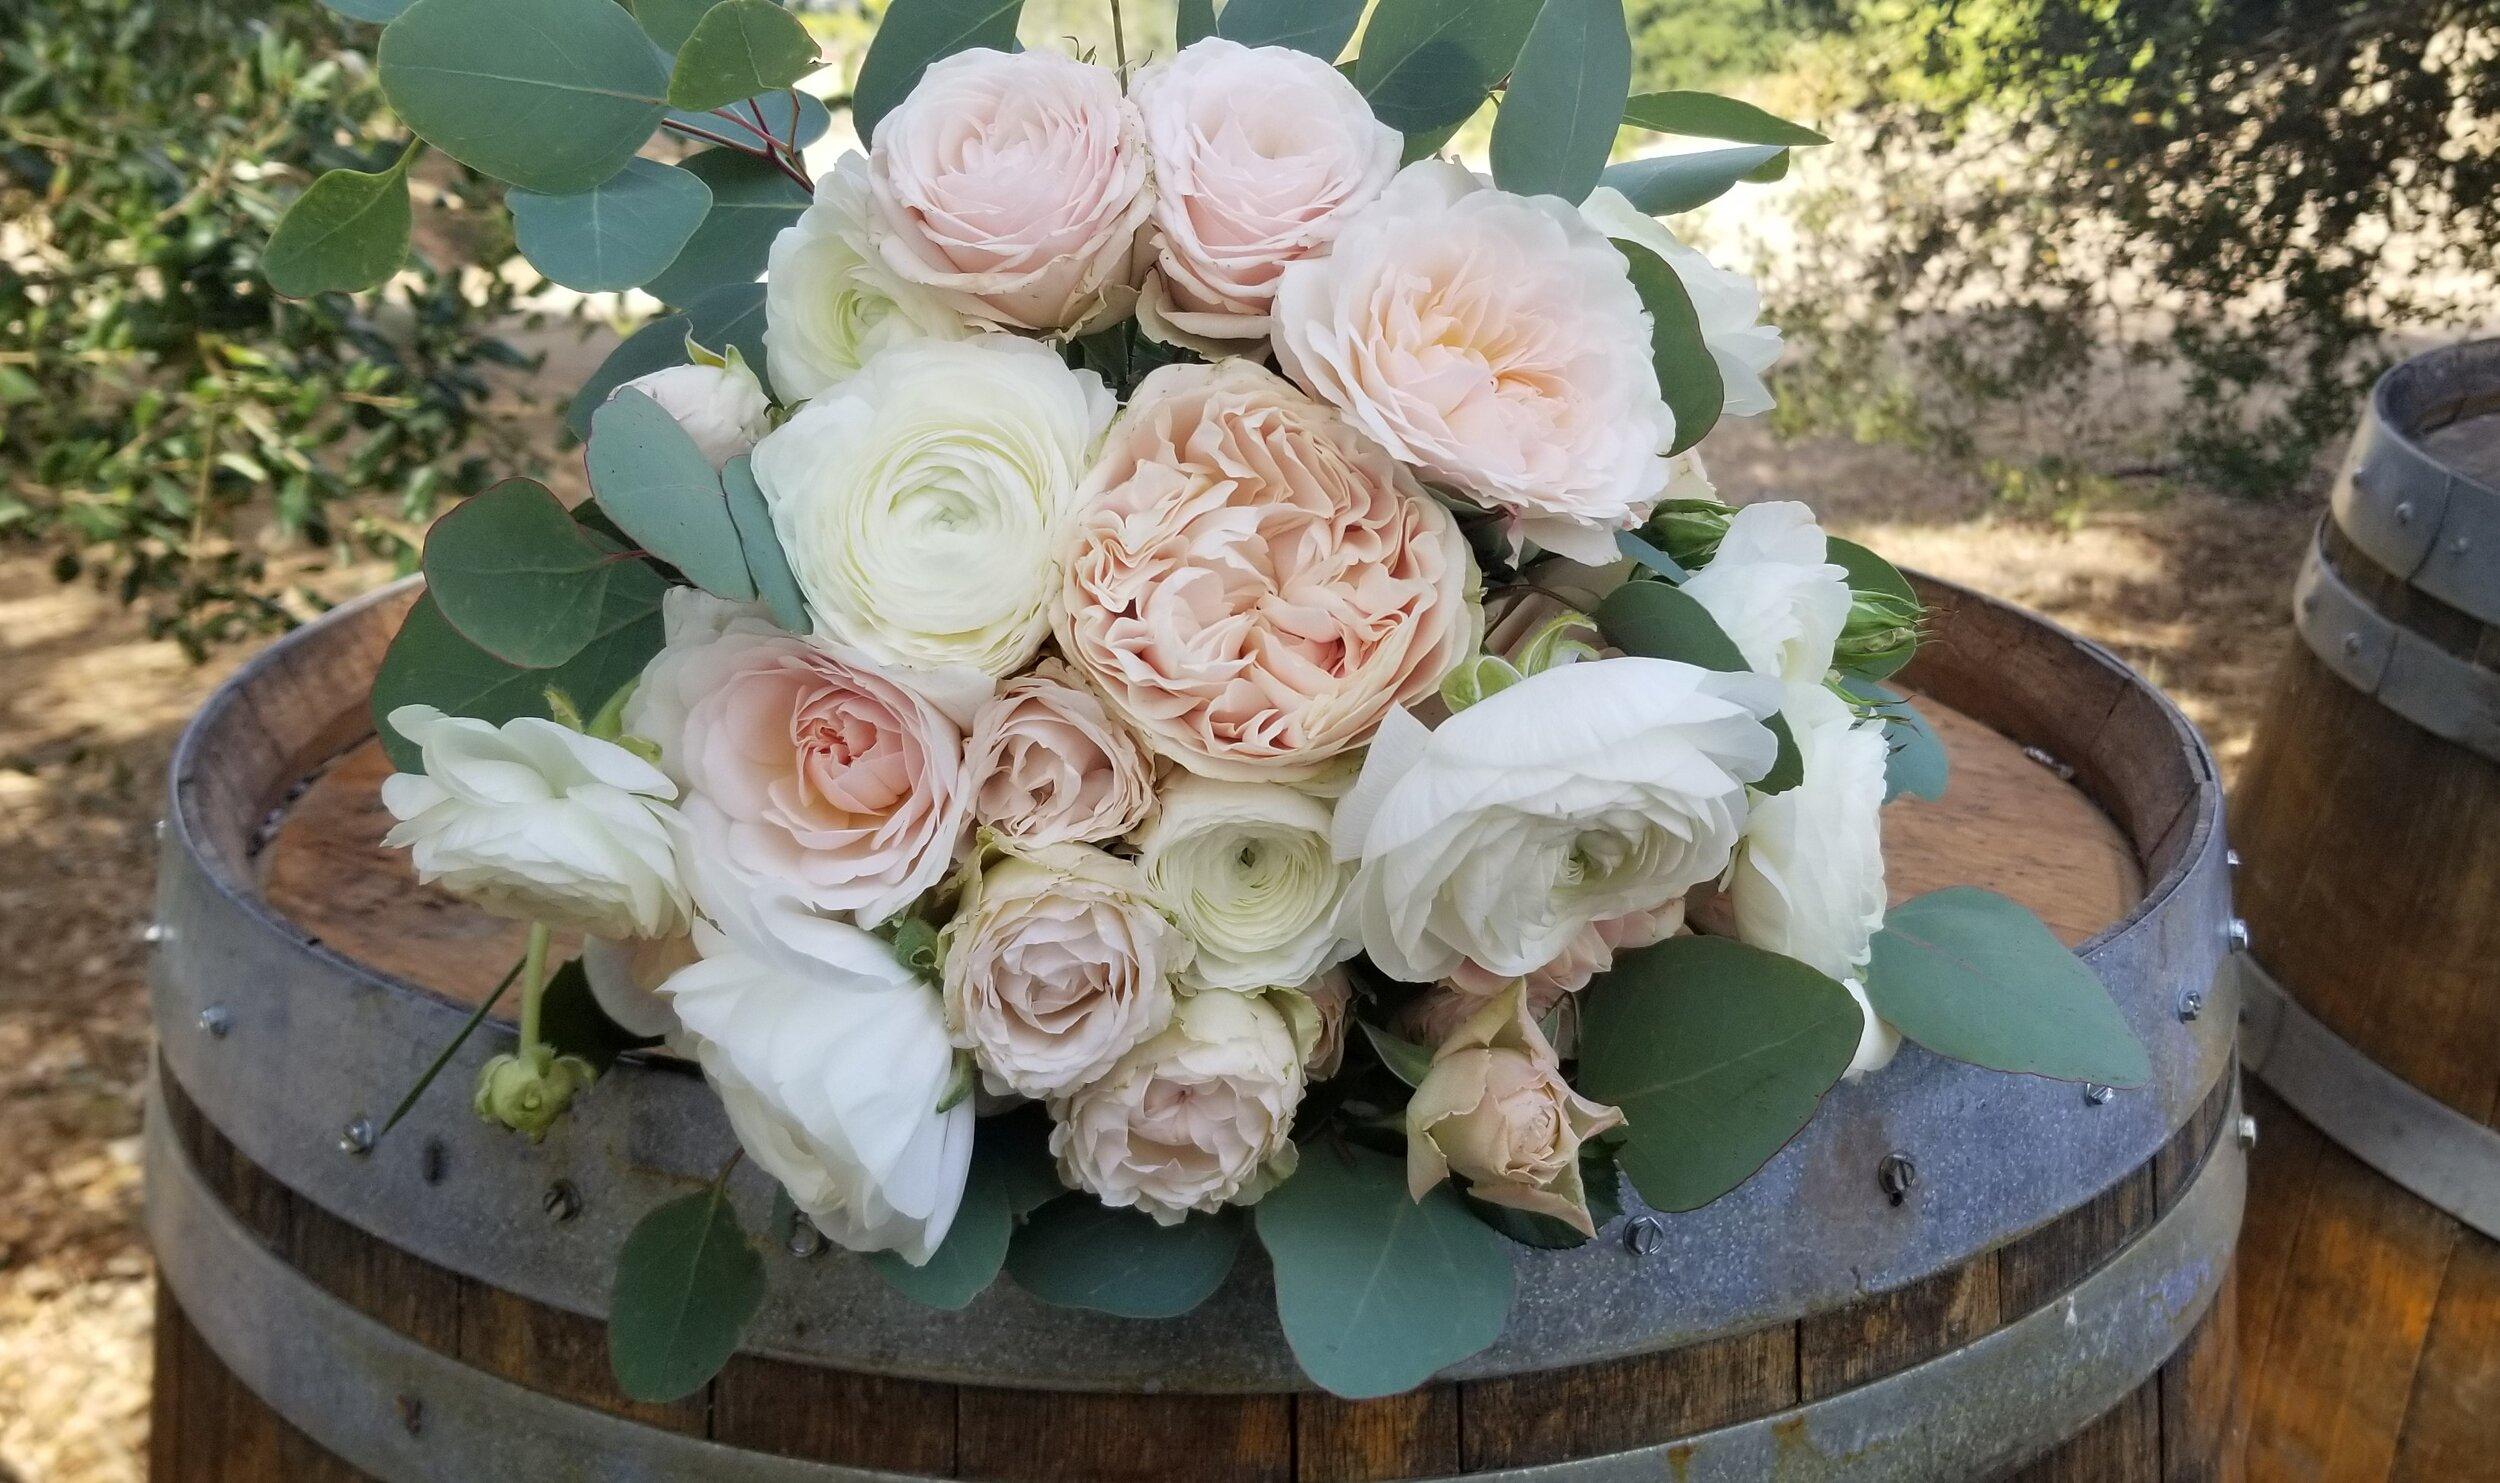 2019-09-29 bouquet Blush and white .jpg